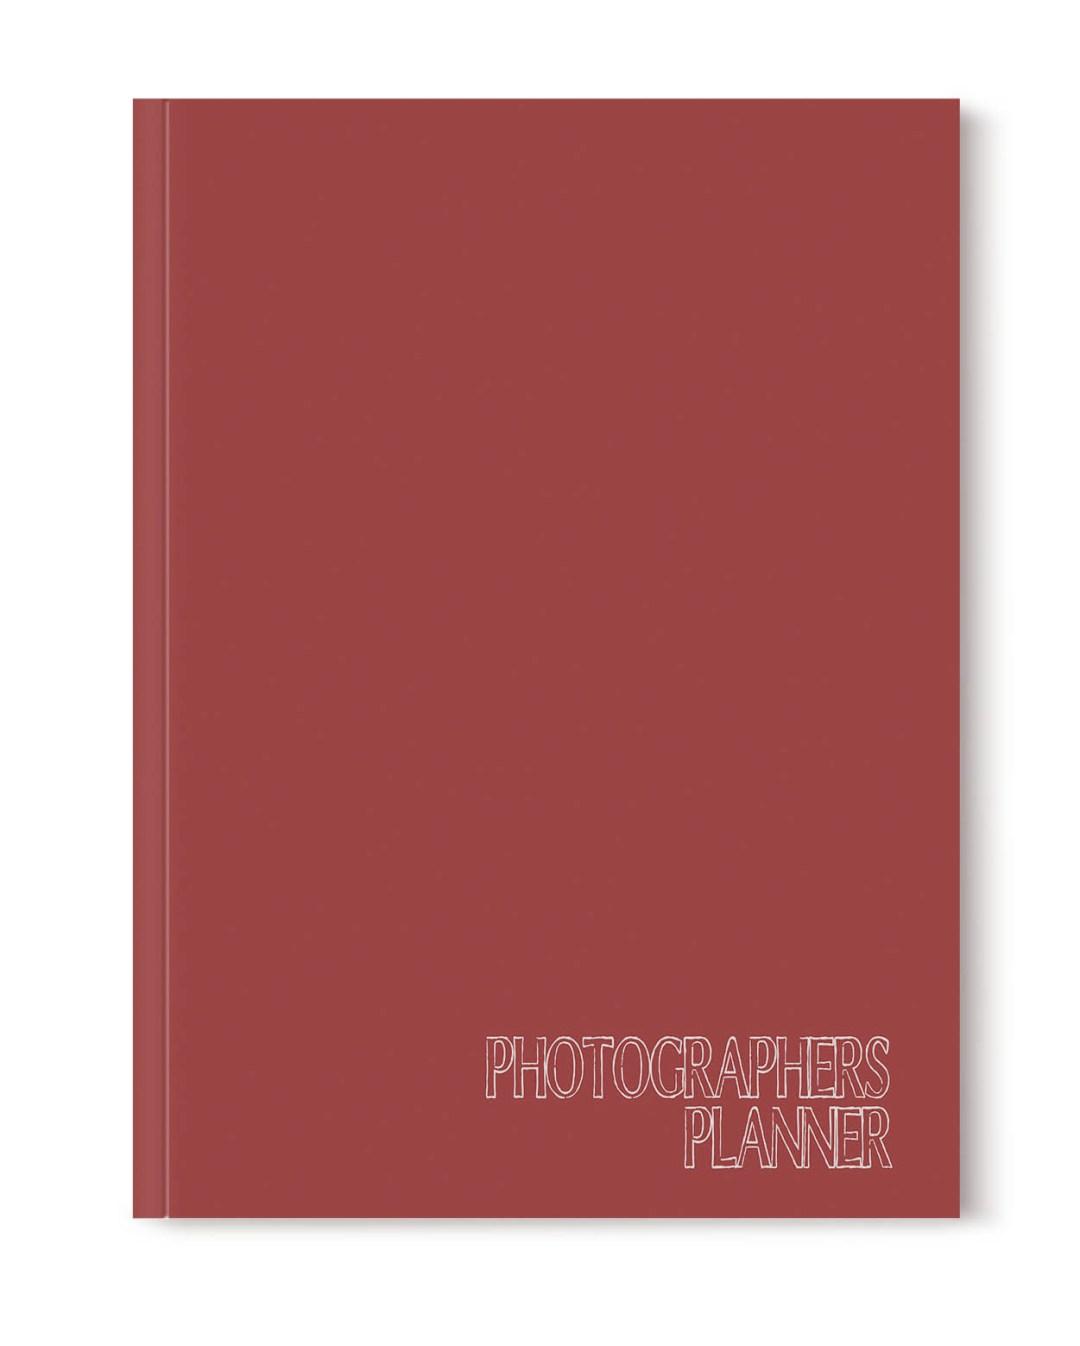 Photographers Planner